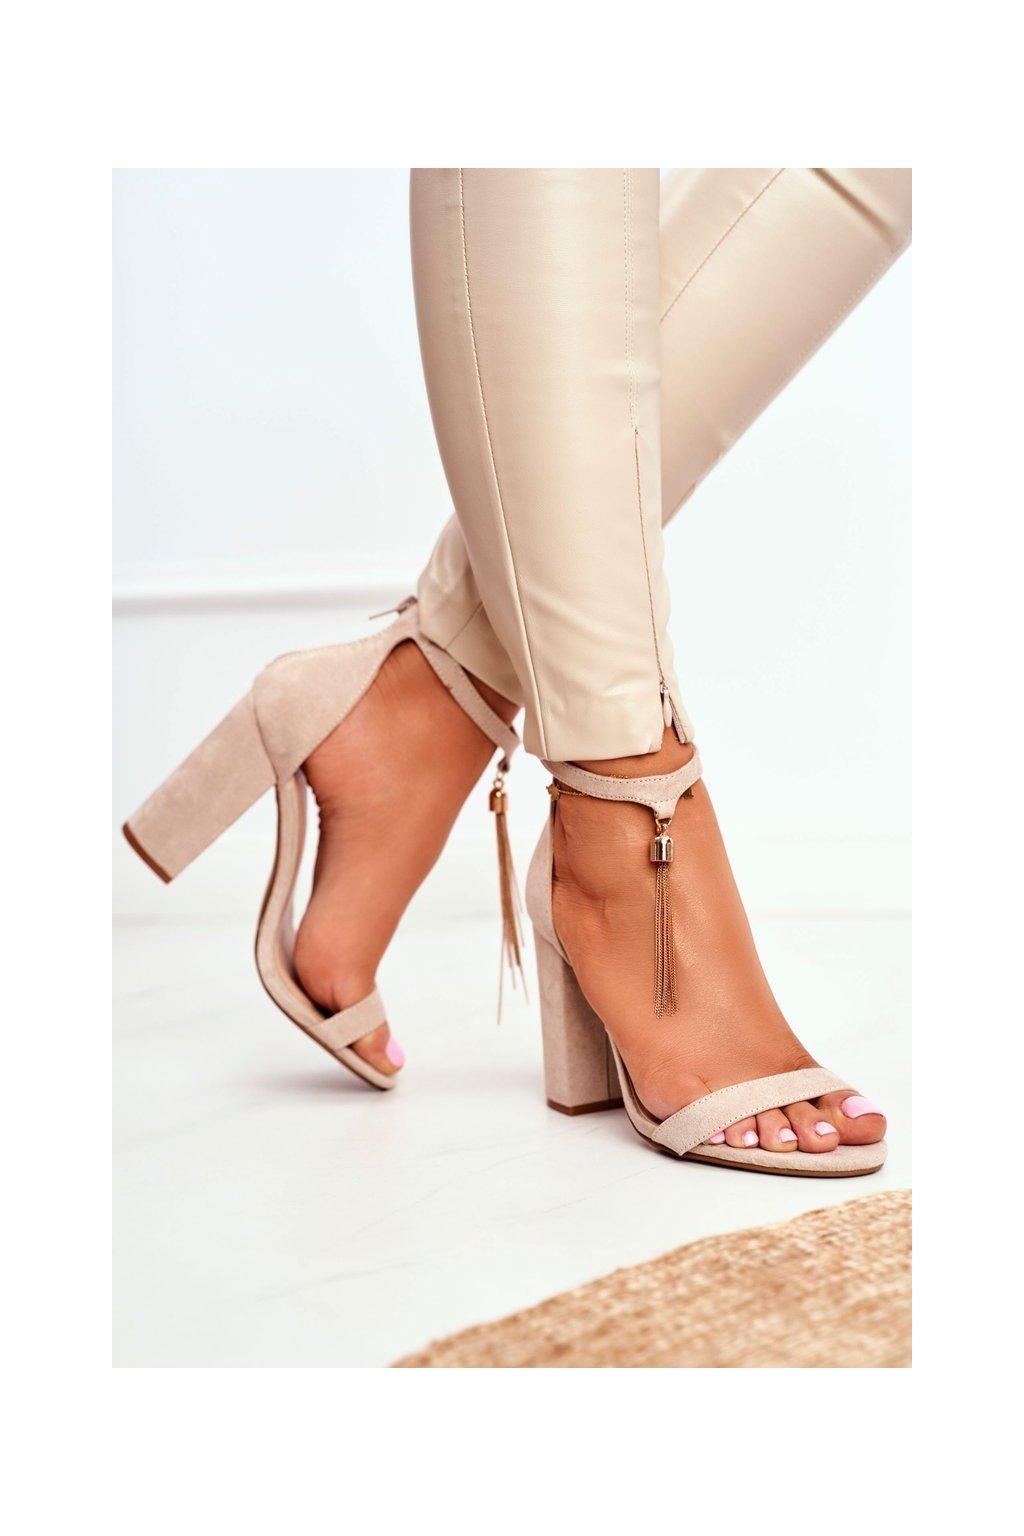 Dámske Sandále béžové semišové